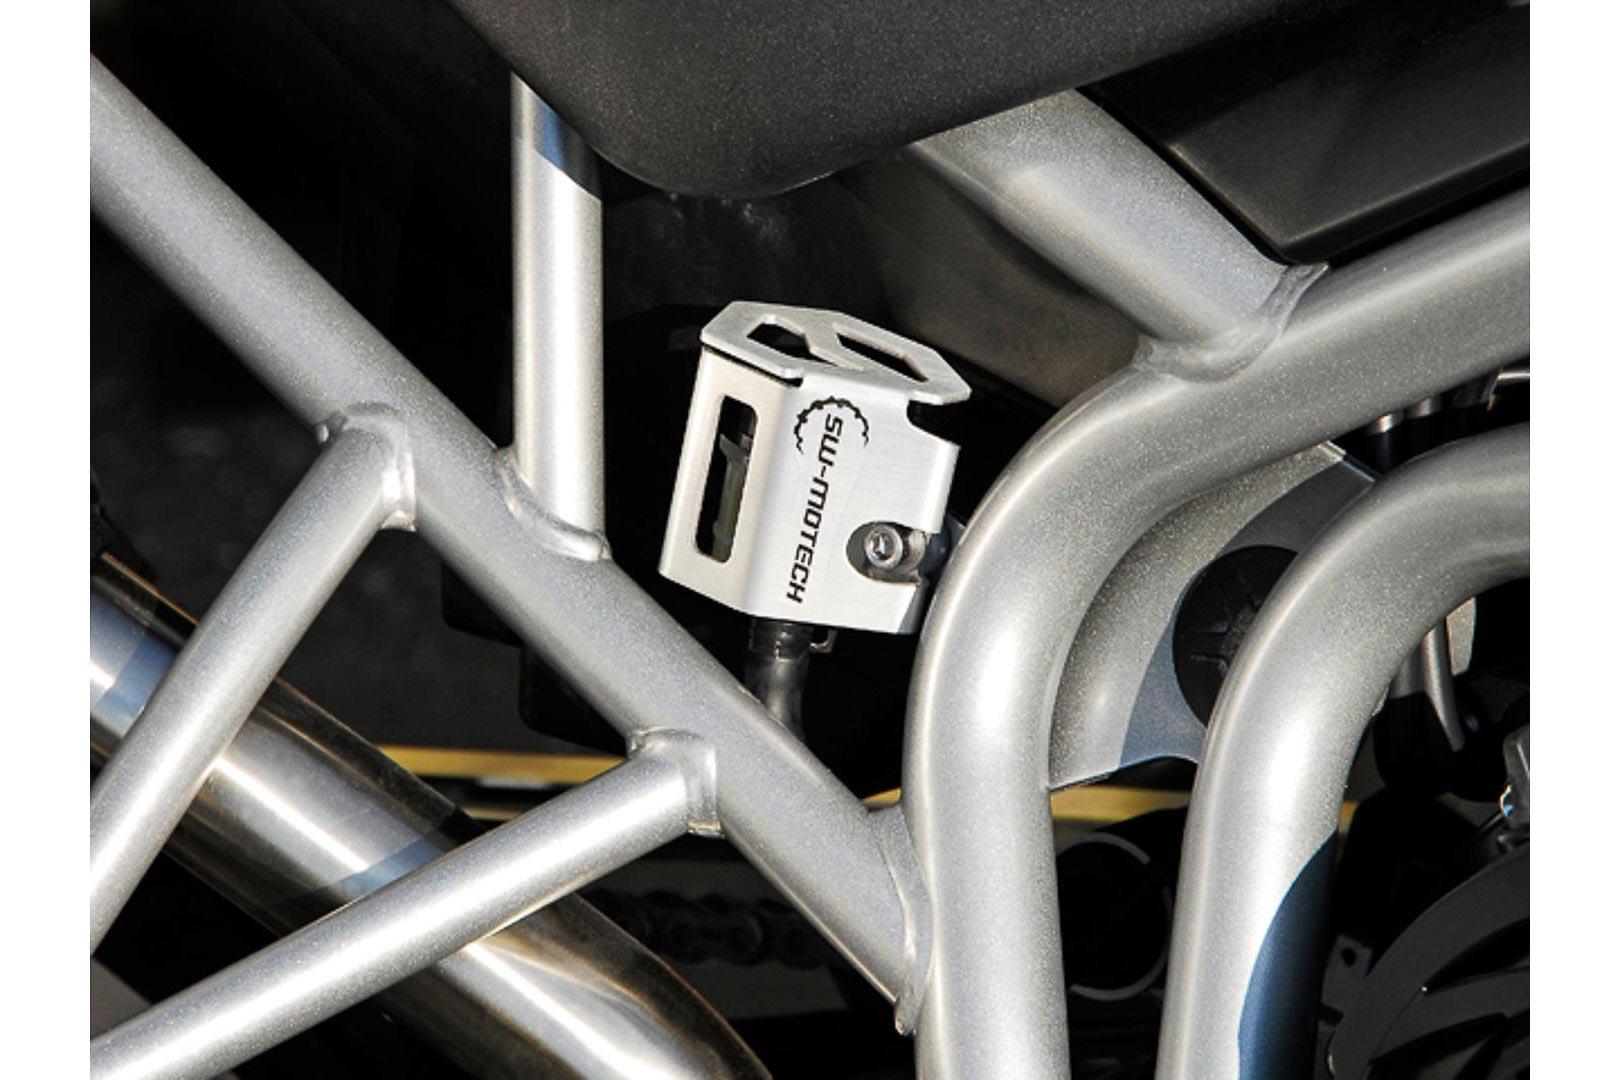 SW-Motech jarrunestesäiliön suoja Triumph Tiger 800/800XC